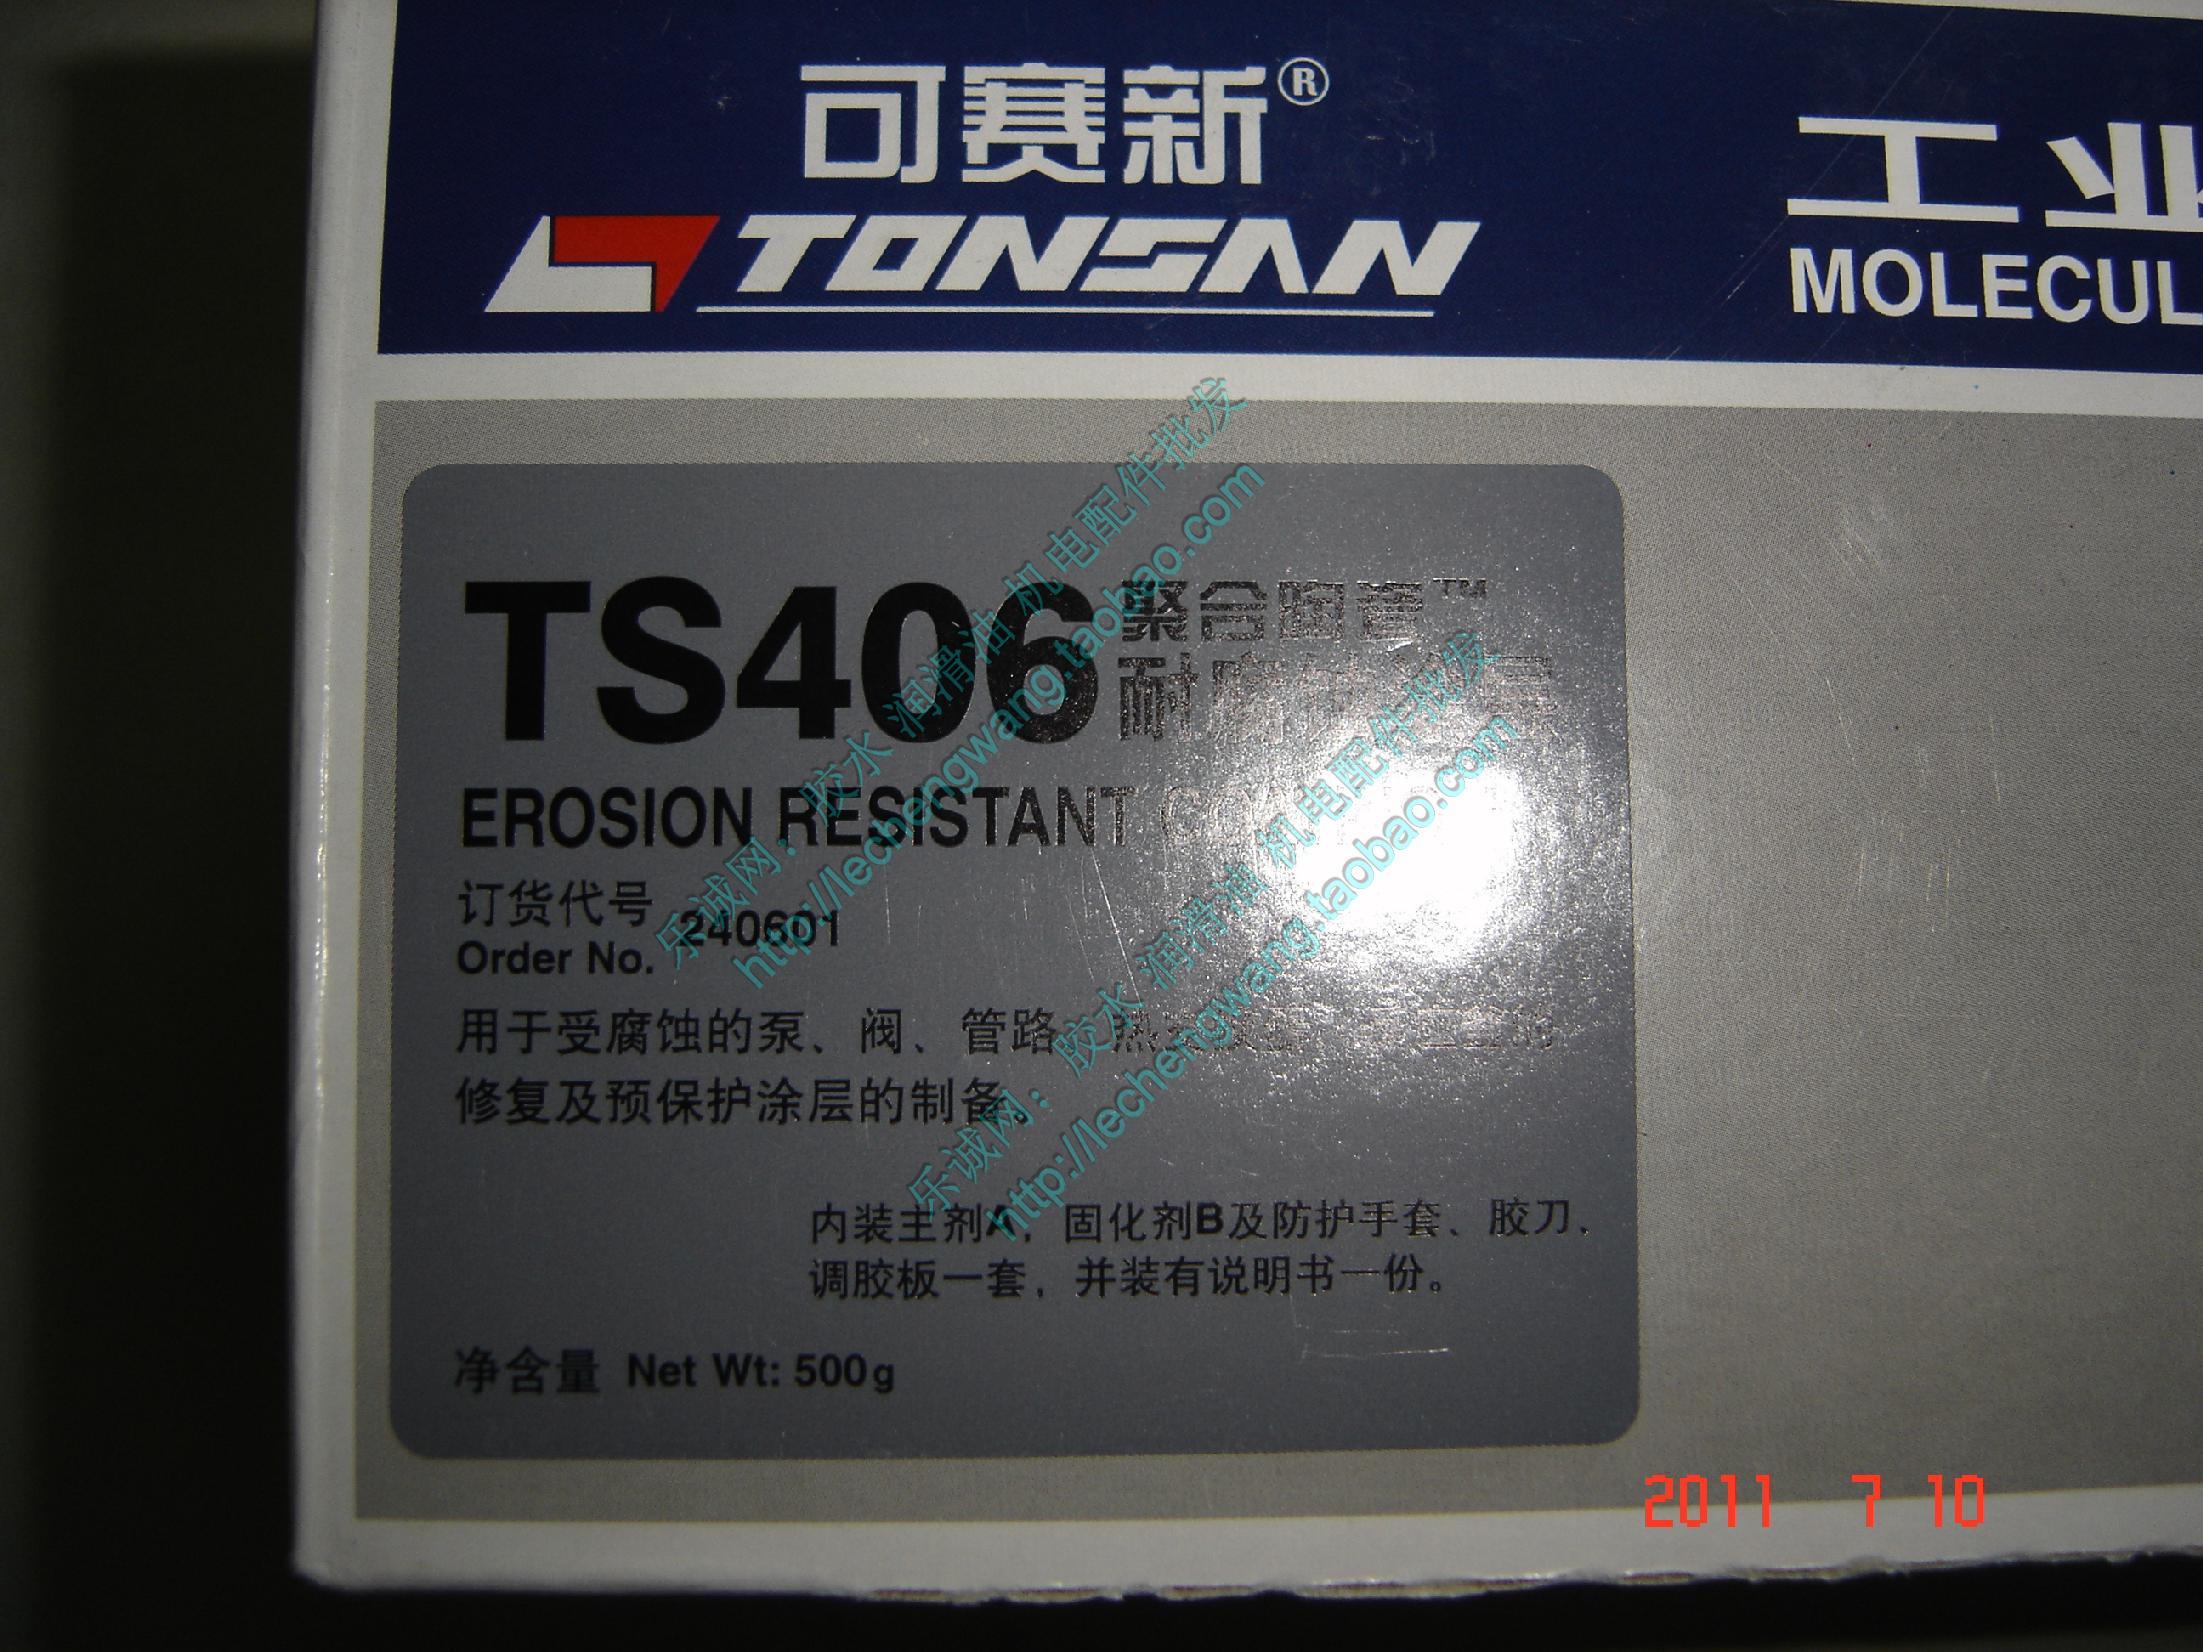 Ts406 reparatur neUe Keramik - corsa 406 polymerisation korrosionsbeständige beschichtungen ts406 Kleber